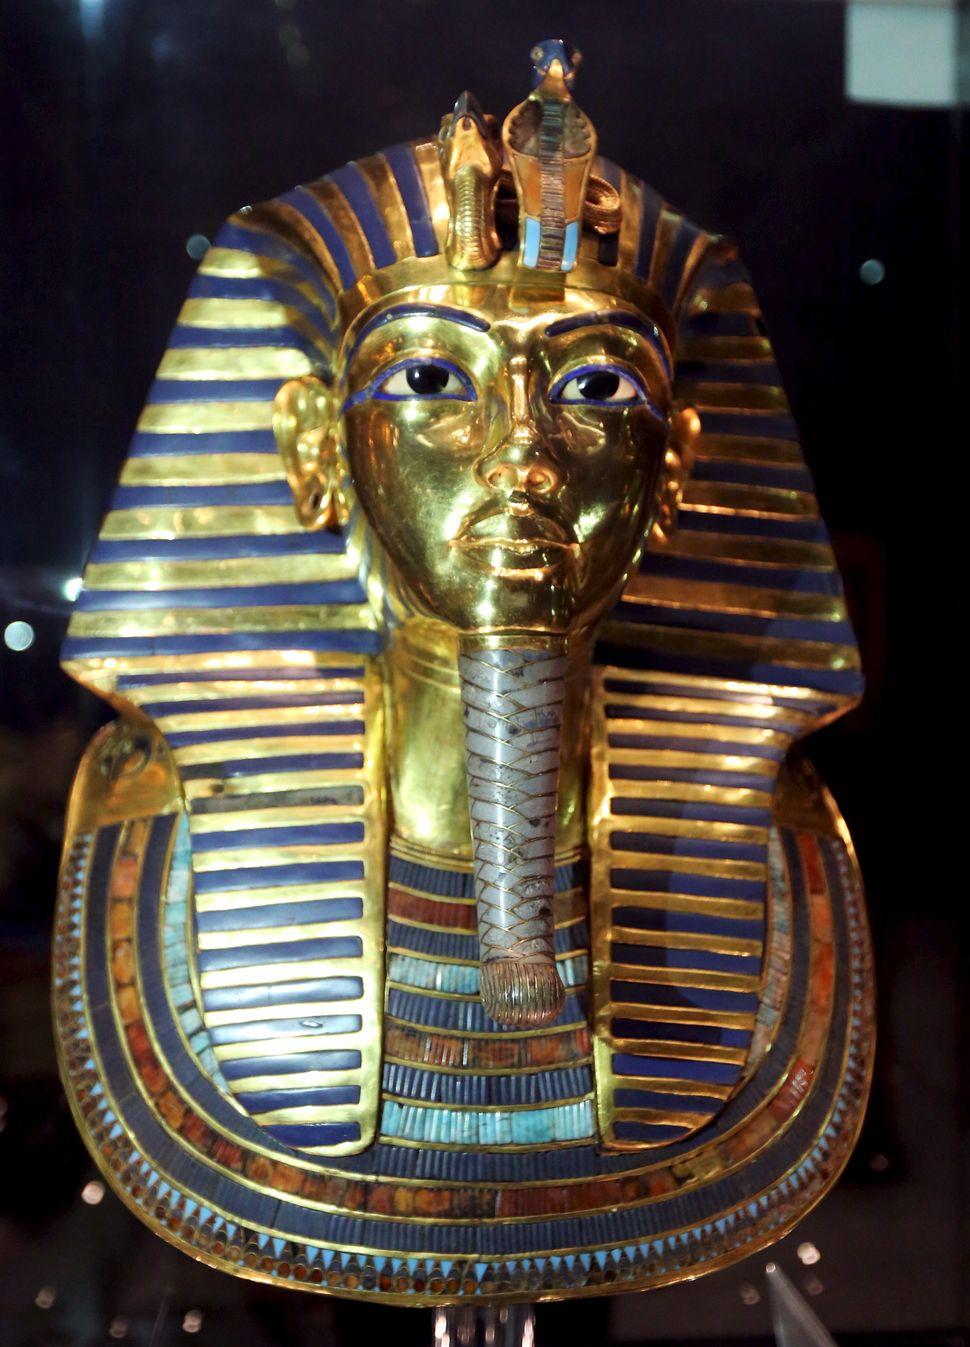 king tutankhamun s tomb radar scans search for secret chambers huffpost uk. Black Bedroom Furniture Sets. Home Design Ideas